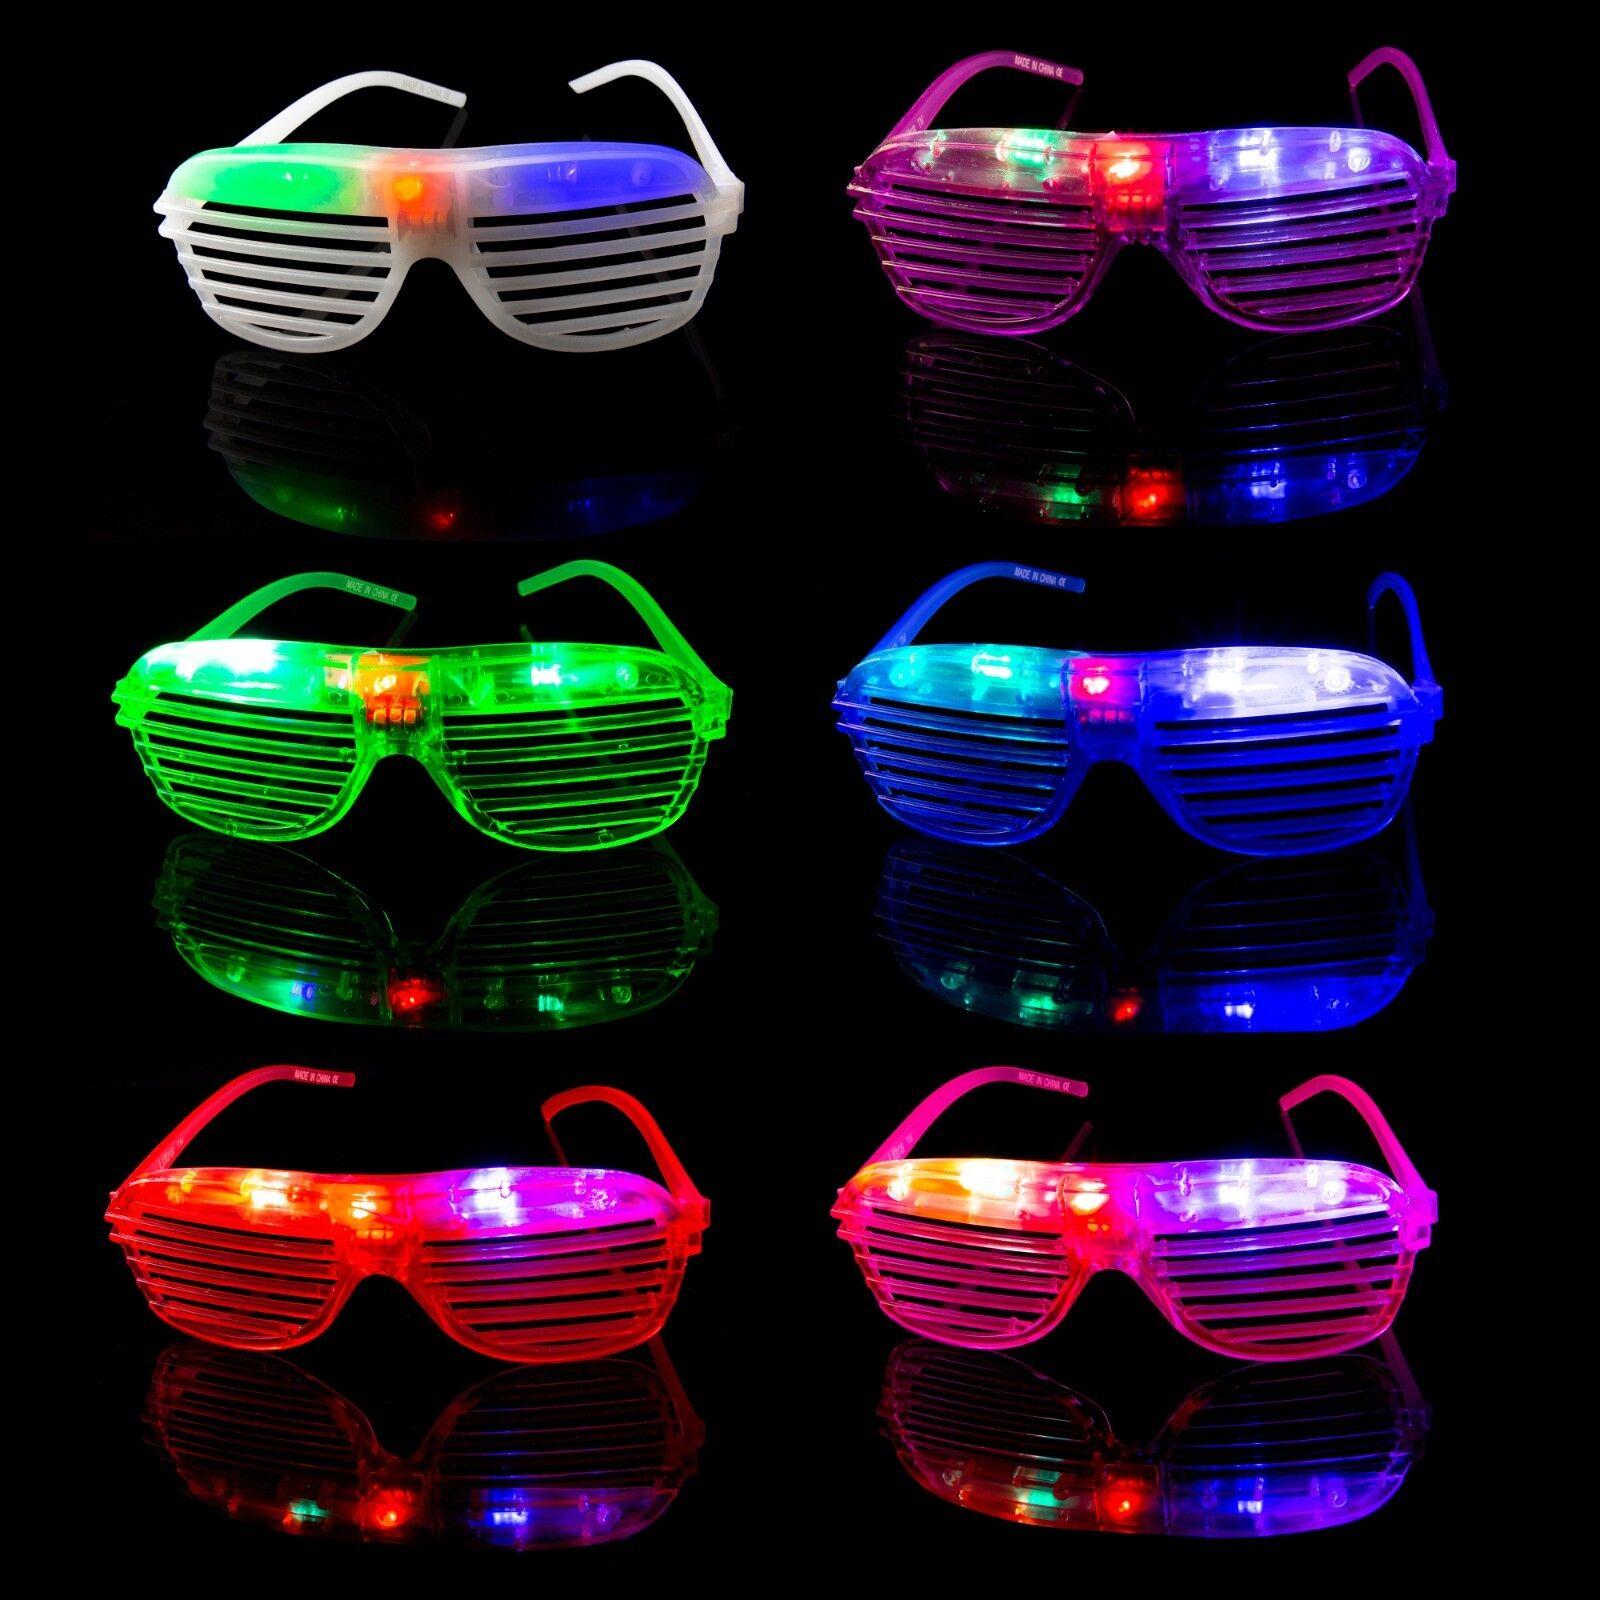 5 Flashing LED Shutter Glasses Light Up Rave Slotted Party Glow Shades Fun UK